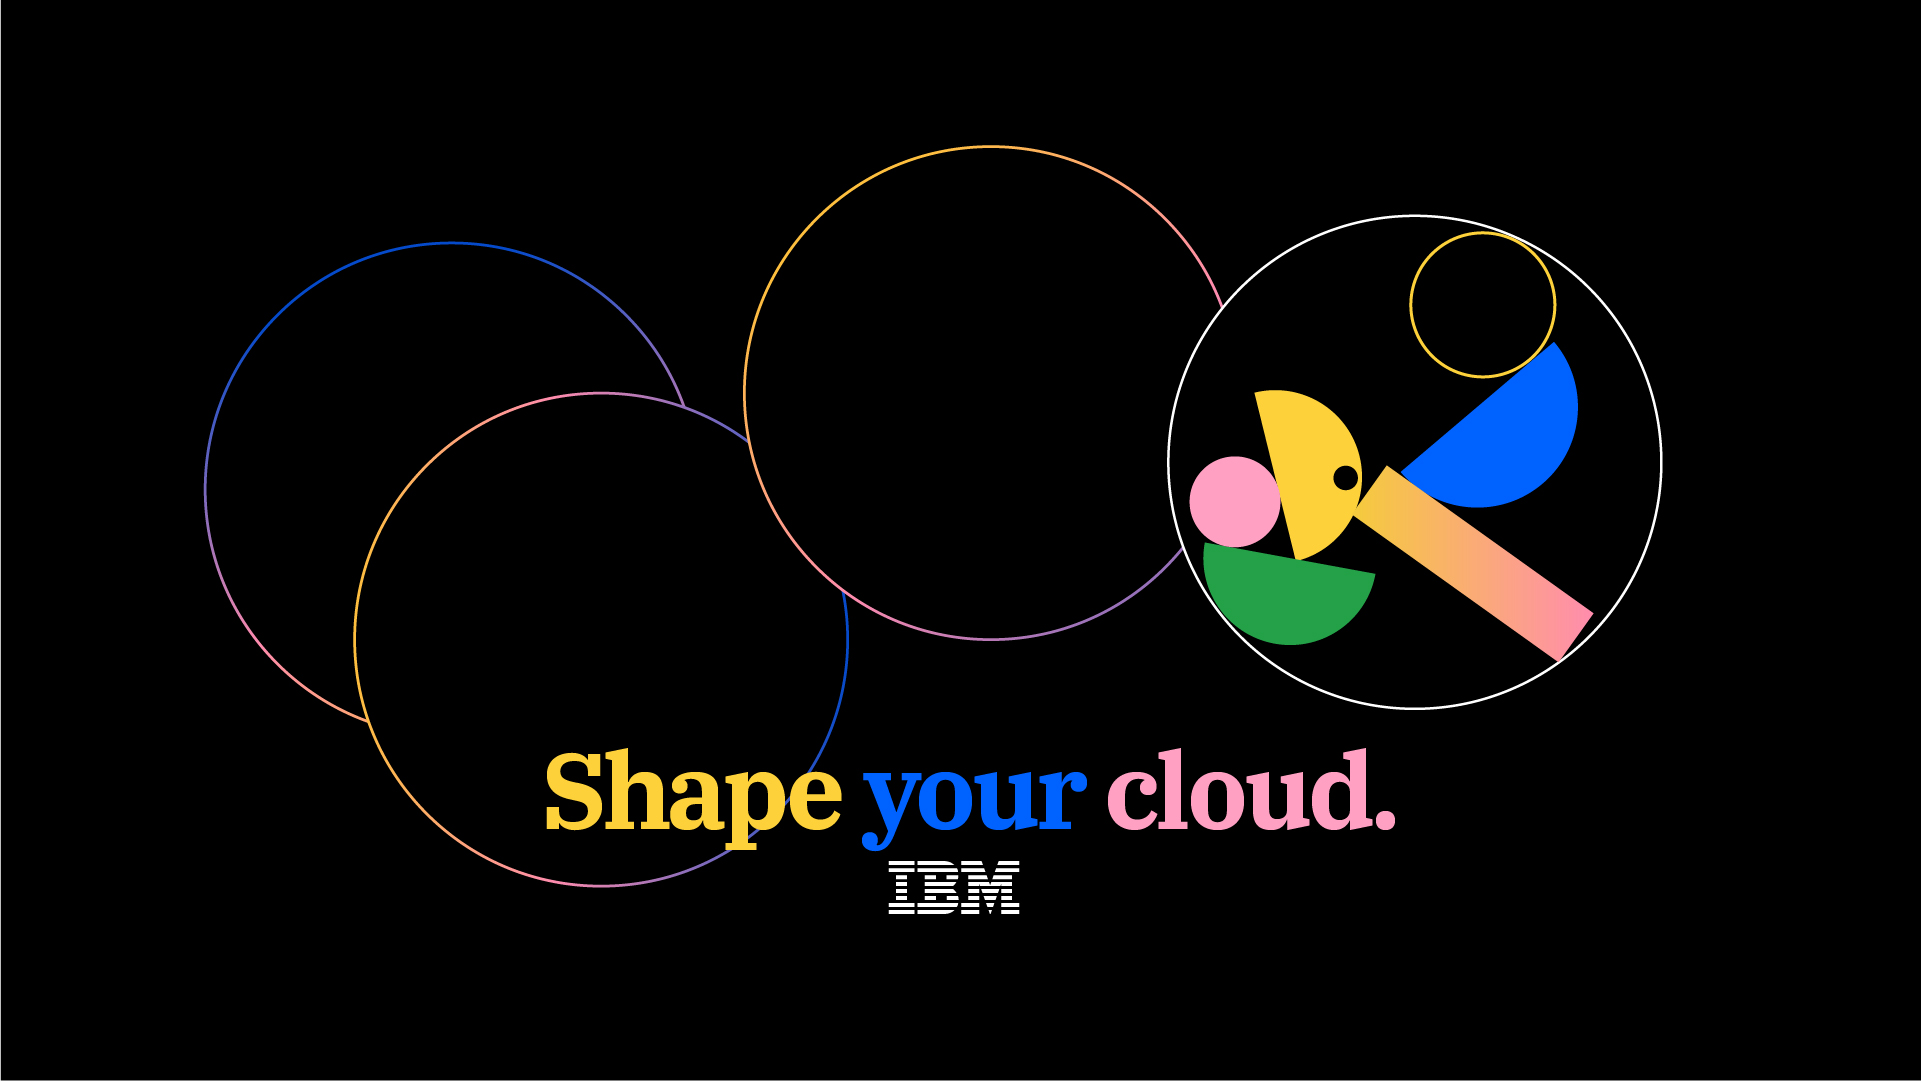 IBM_SHAPE-YOUR-CLOUD_DC_EDITS_BH_proceso_IBM-process-24.jpg